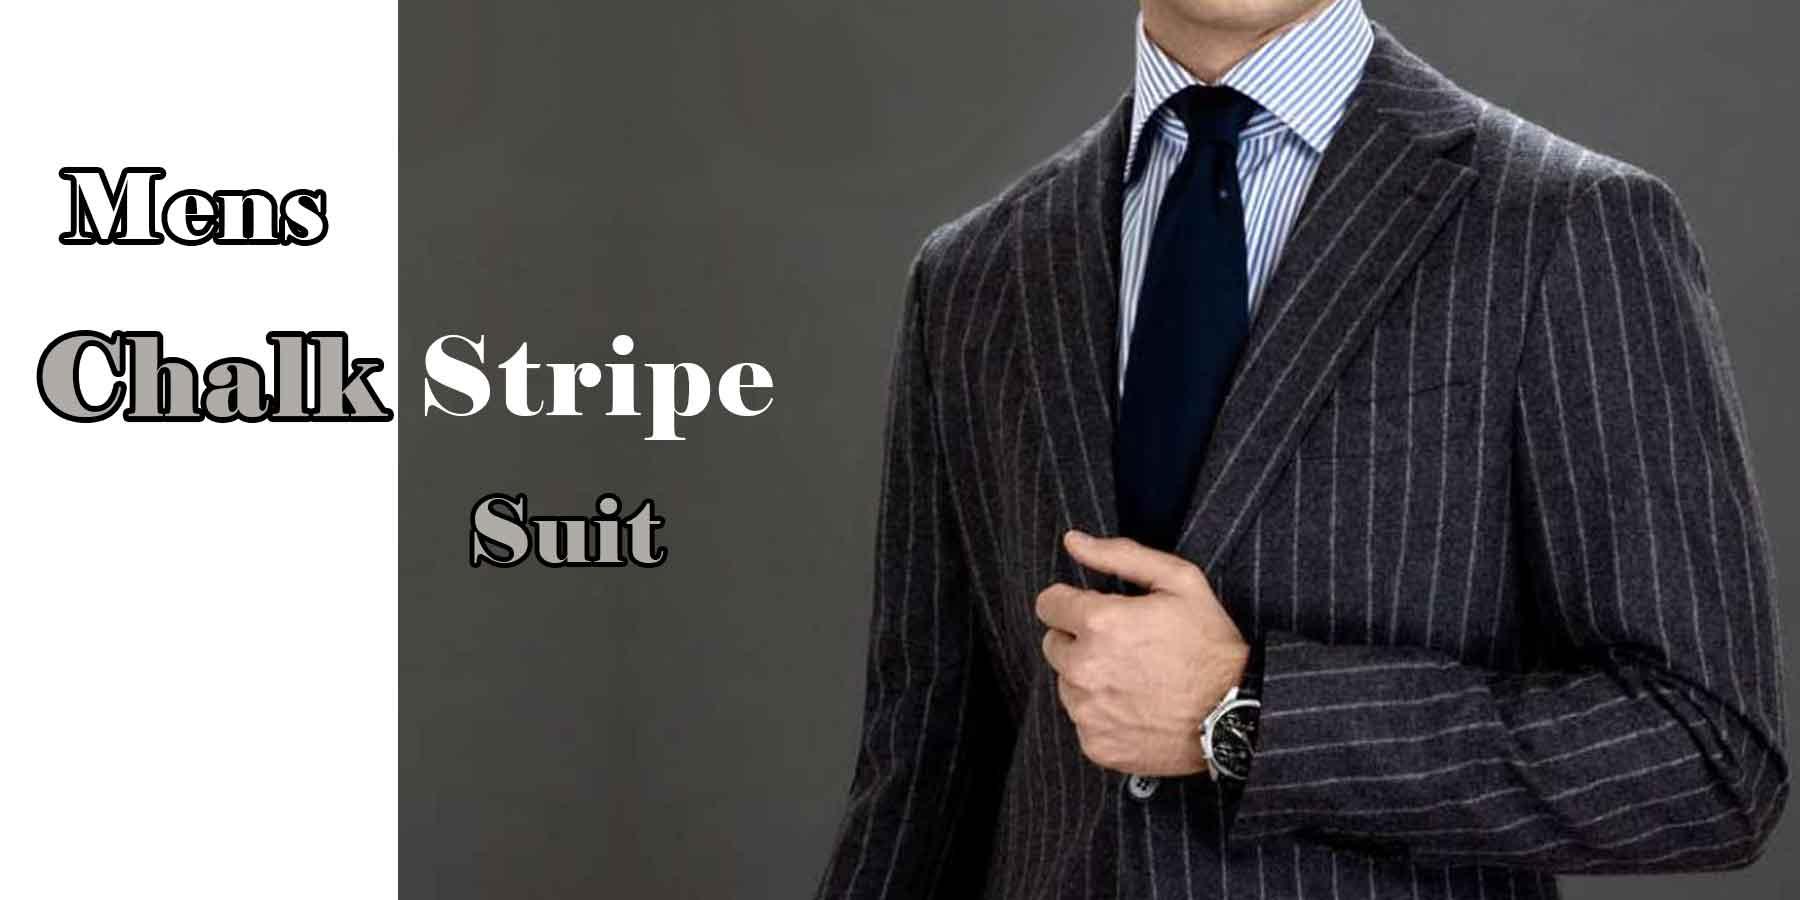 Chalkstripe-Suit